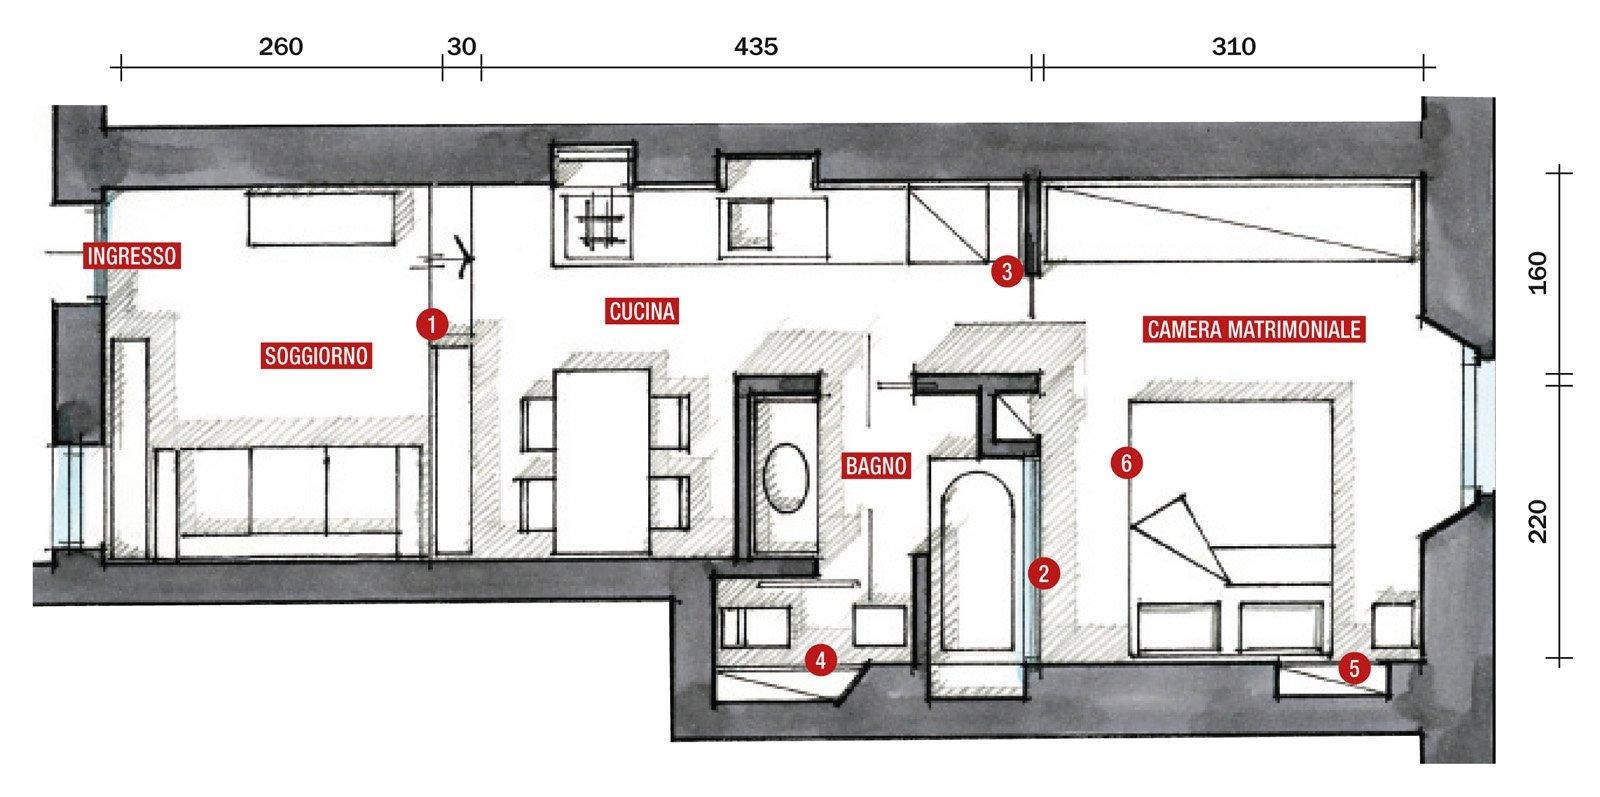 Una casa di 35 mq sfruttati al massimo cose di casa for Layout di una casa di una storia